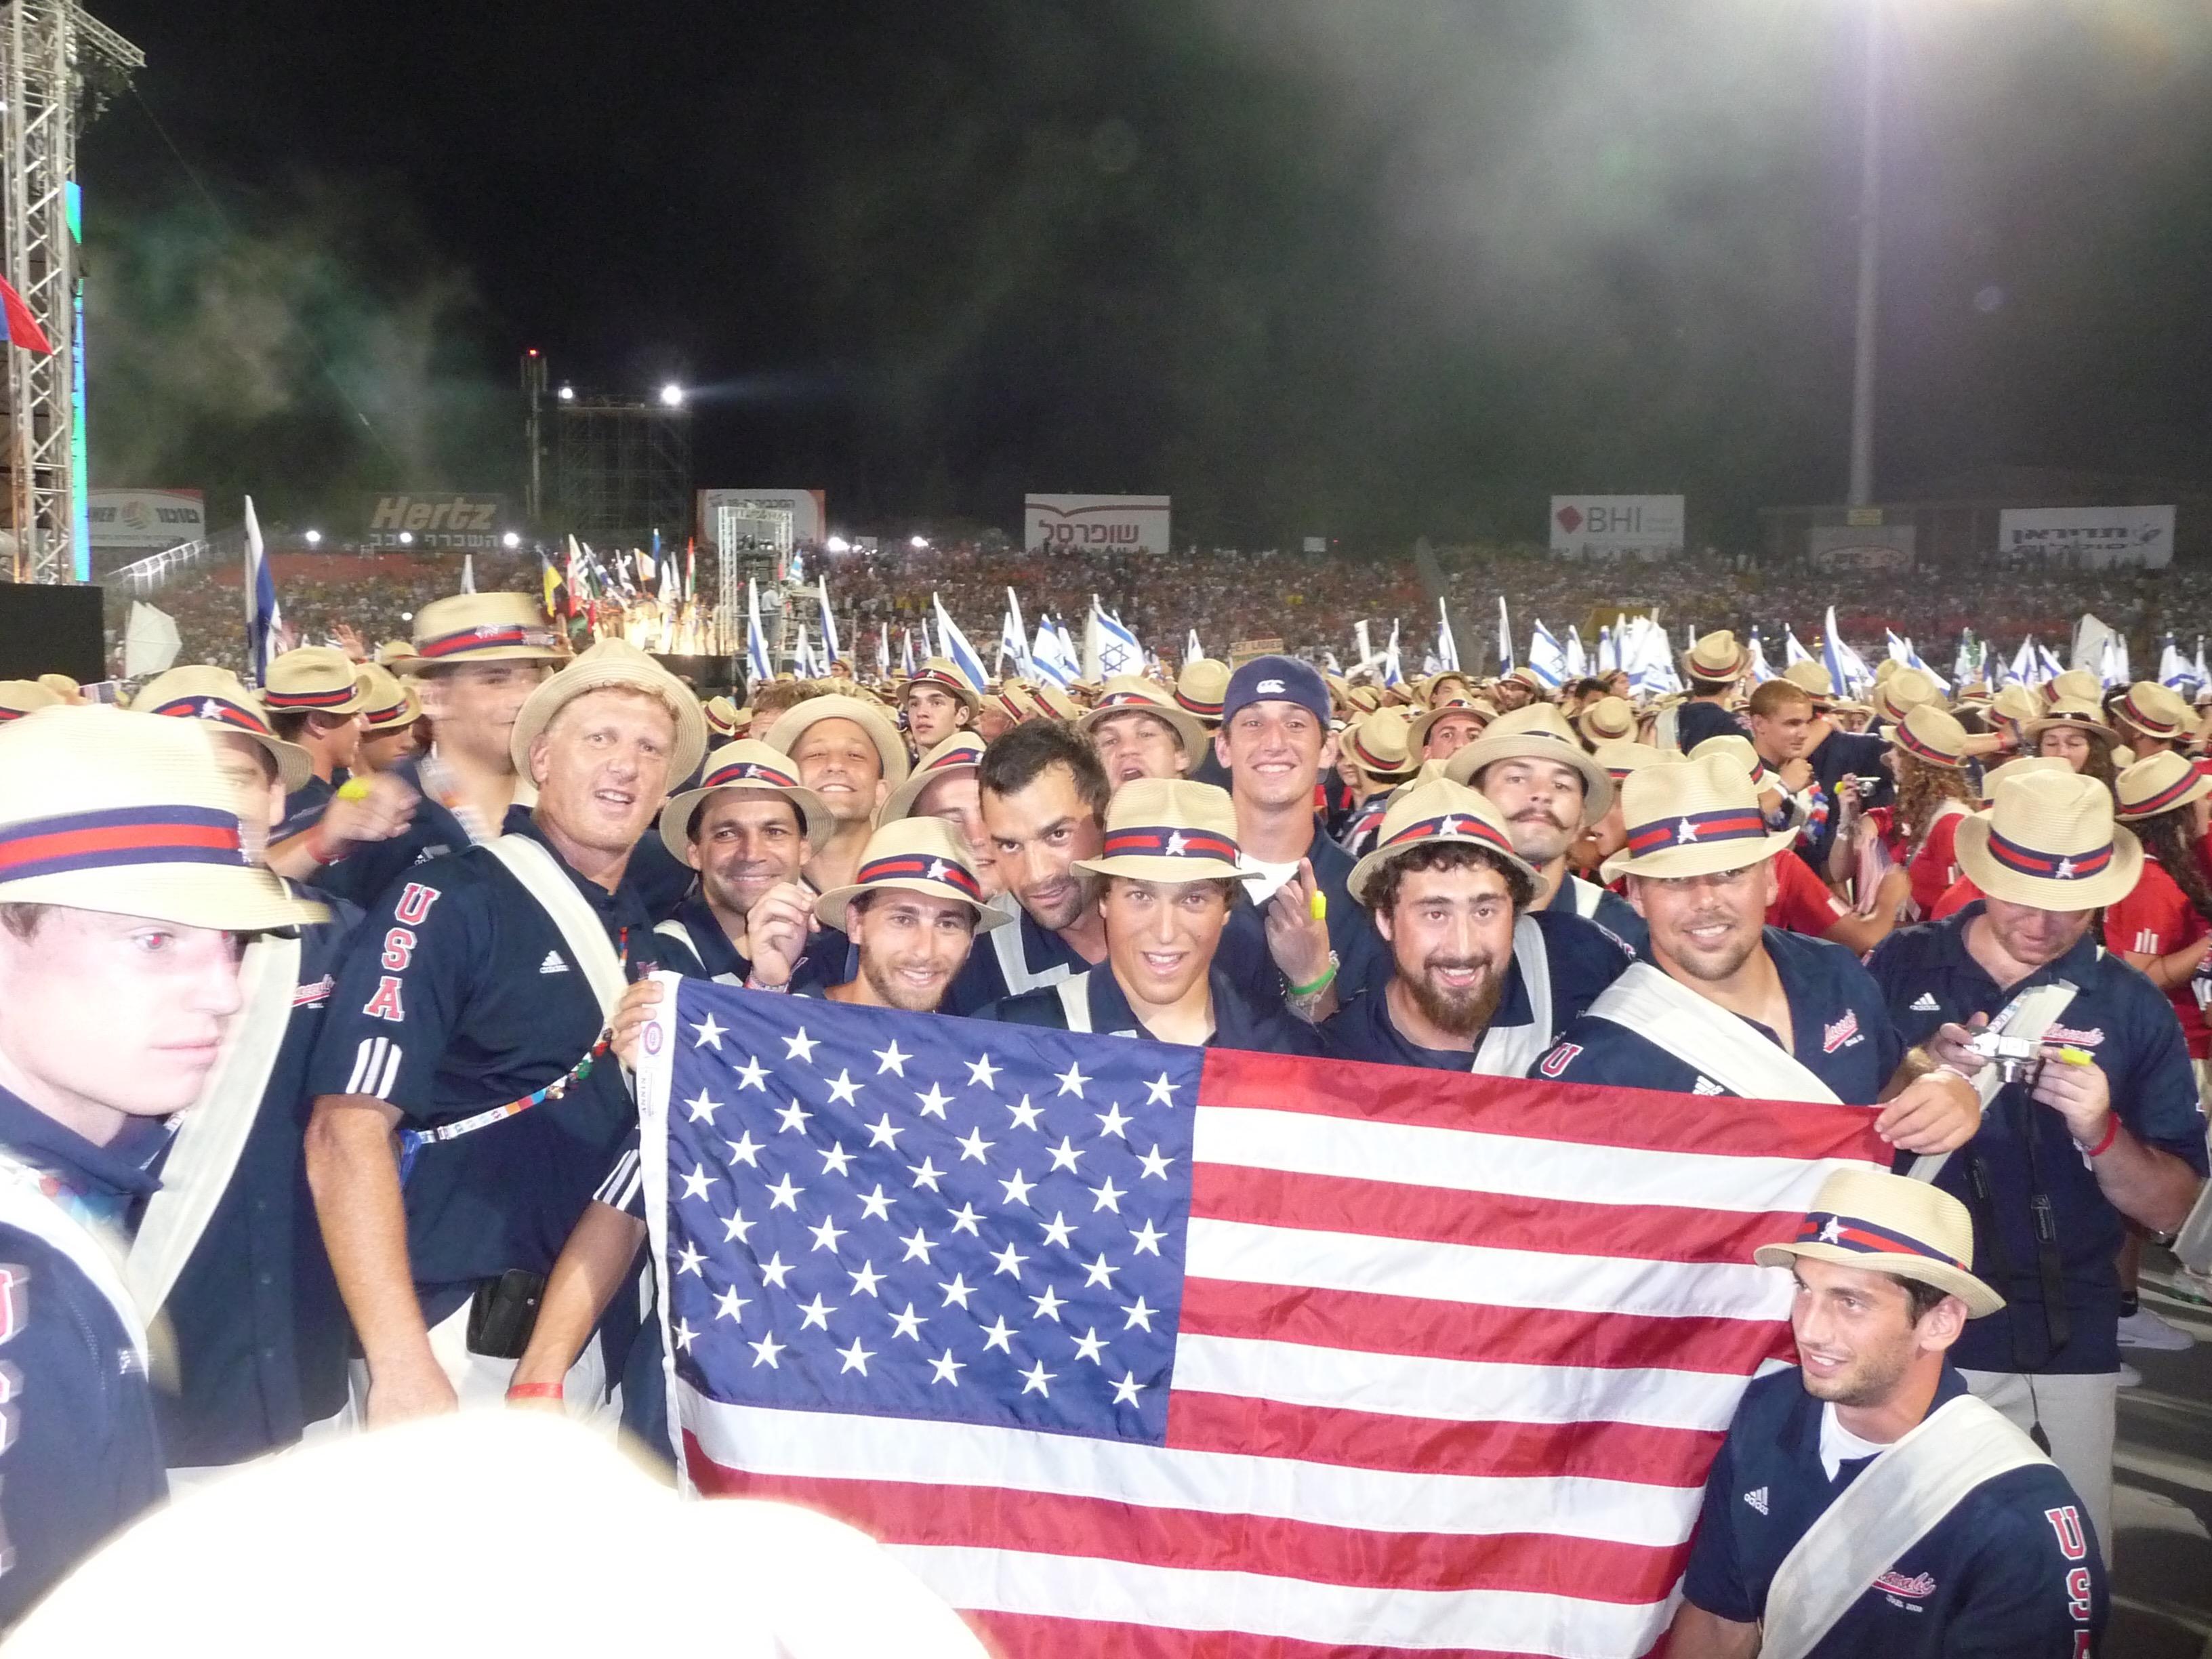 USA Maccabiah Rugby